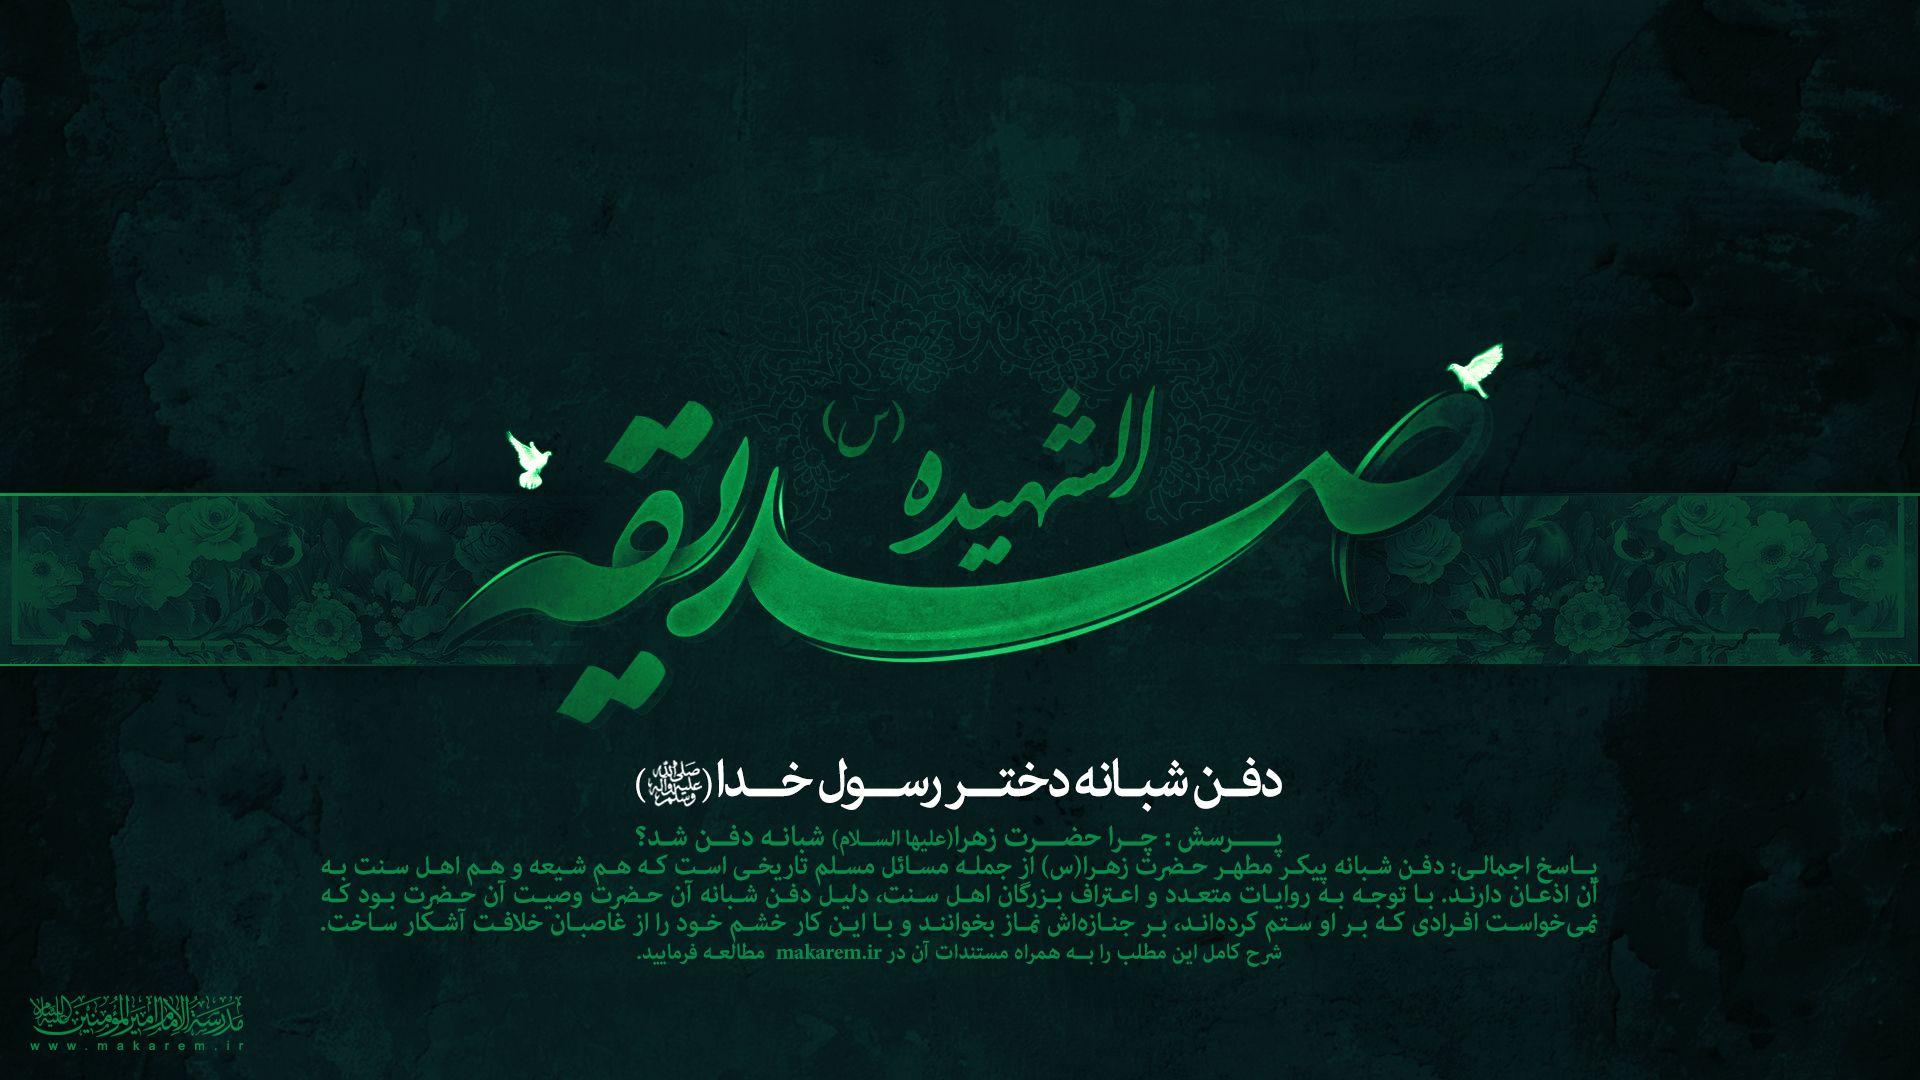 حضرت مادر 09-مدرسه الامام امیر المومنین (ع)